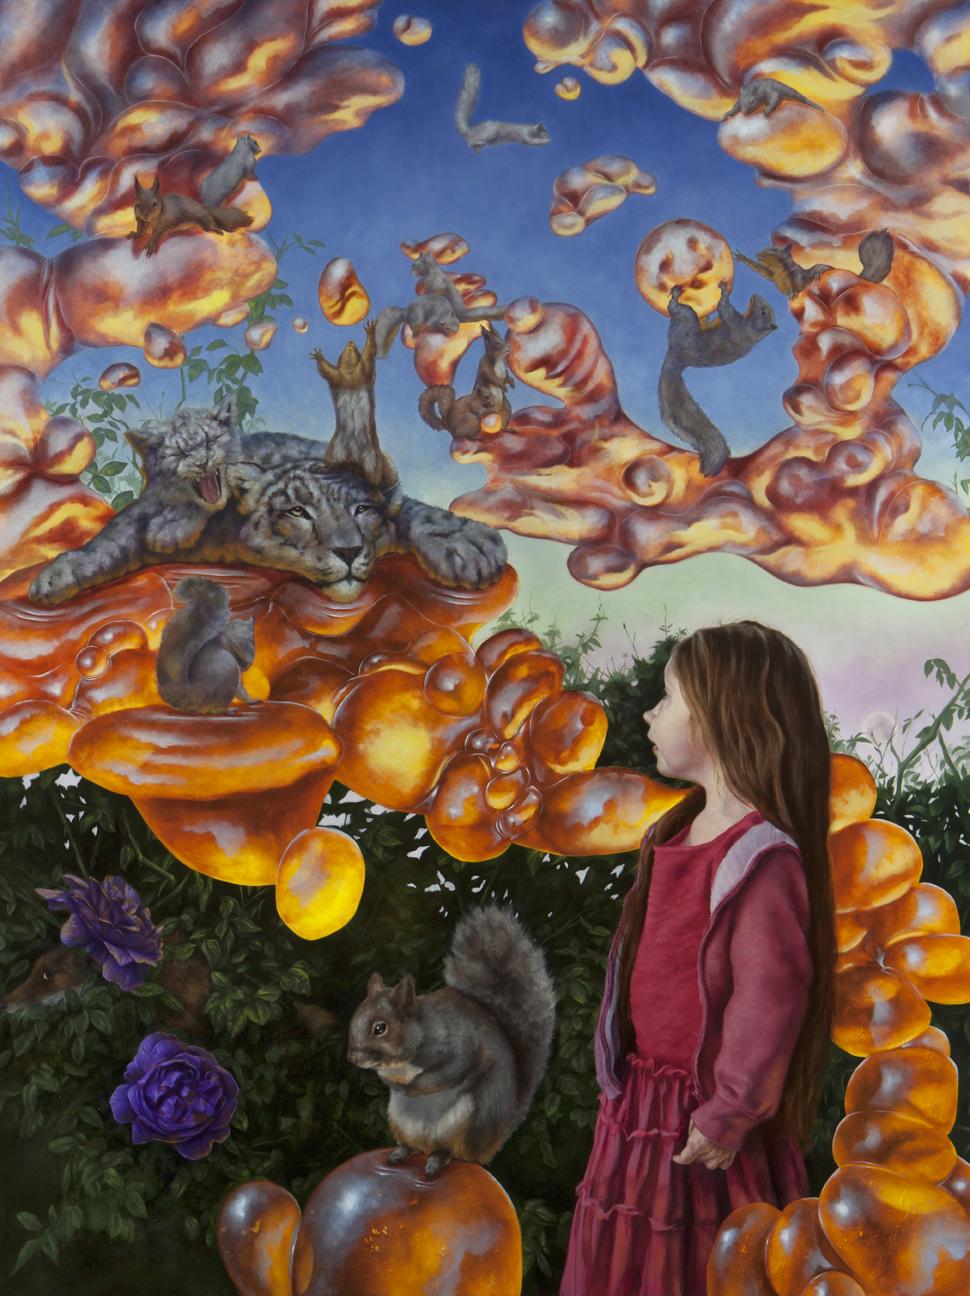 """Wonder� by Cody Jimenez, Oil on panel, 48in x 36in, 2017 (Cody Jimenez)"